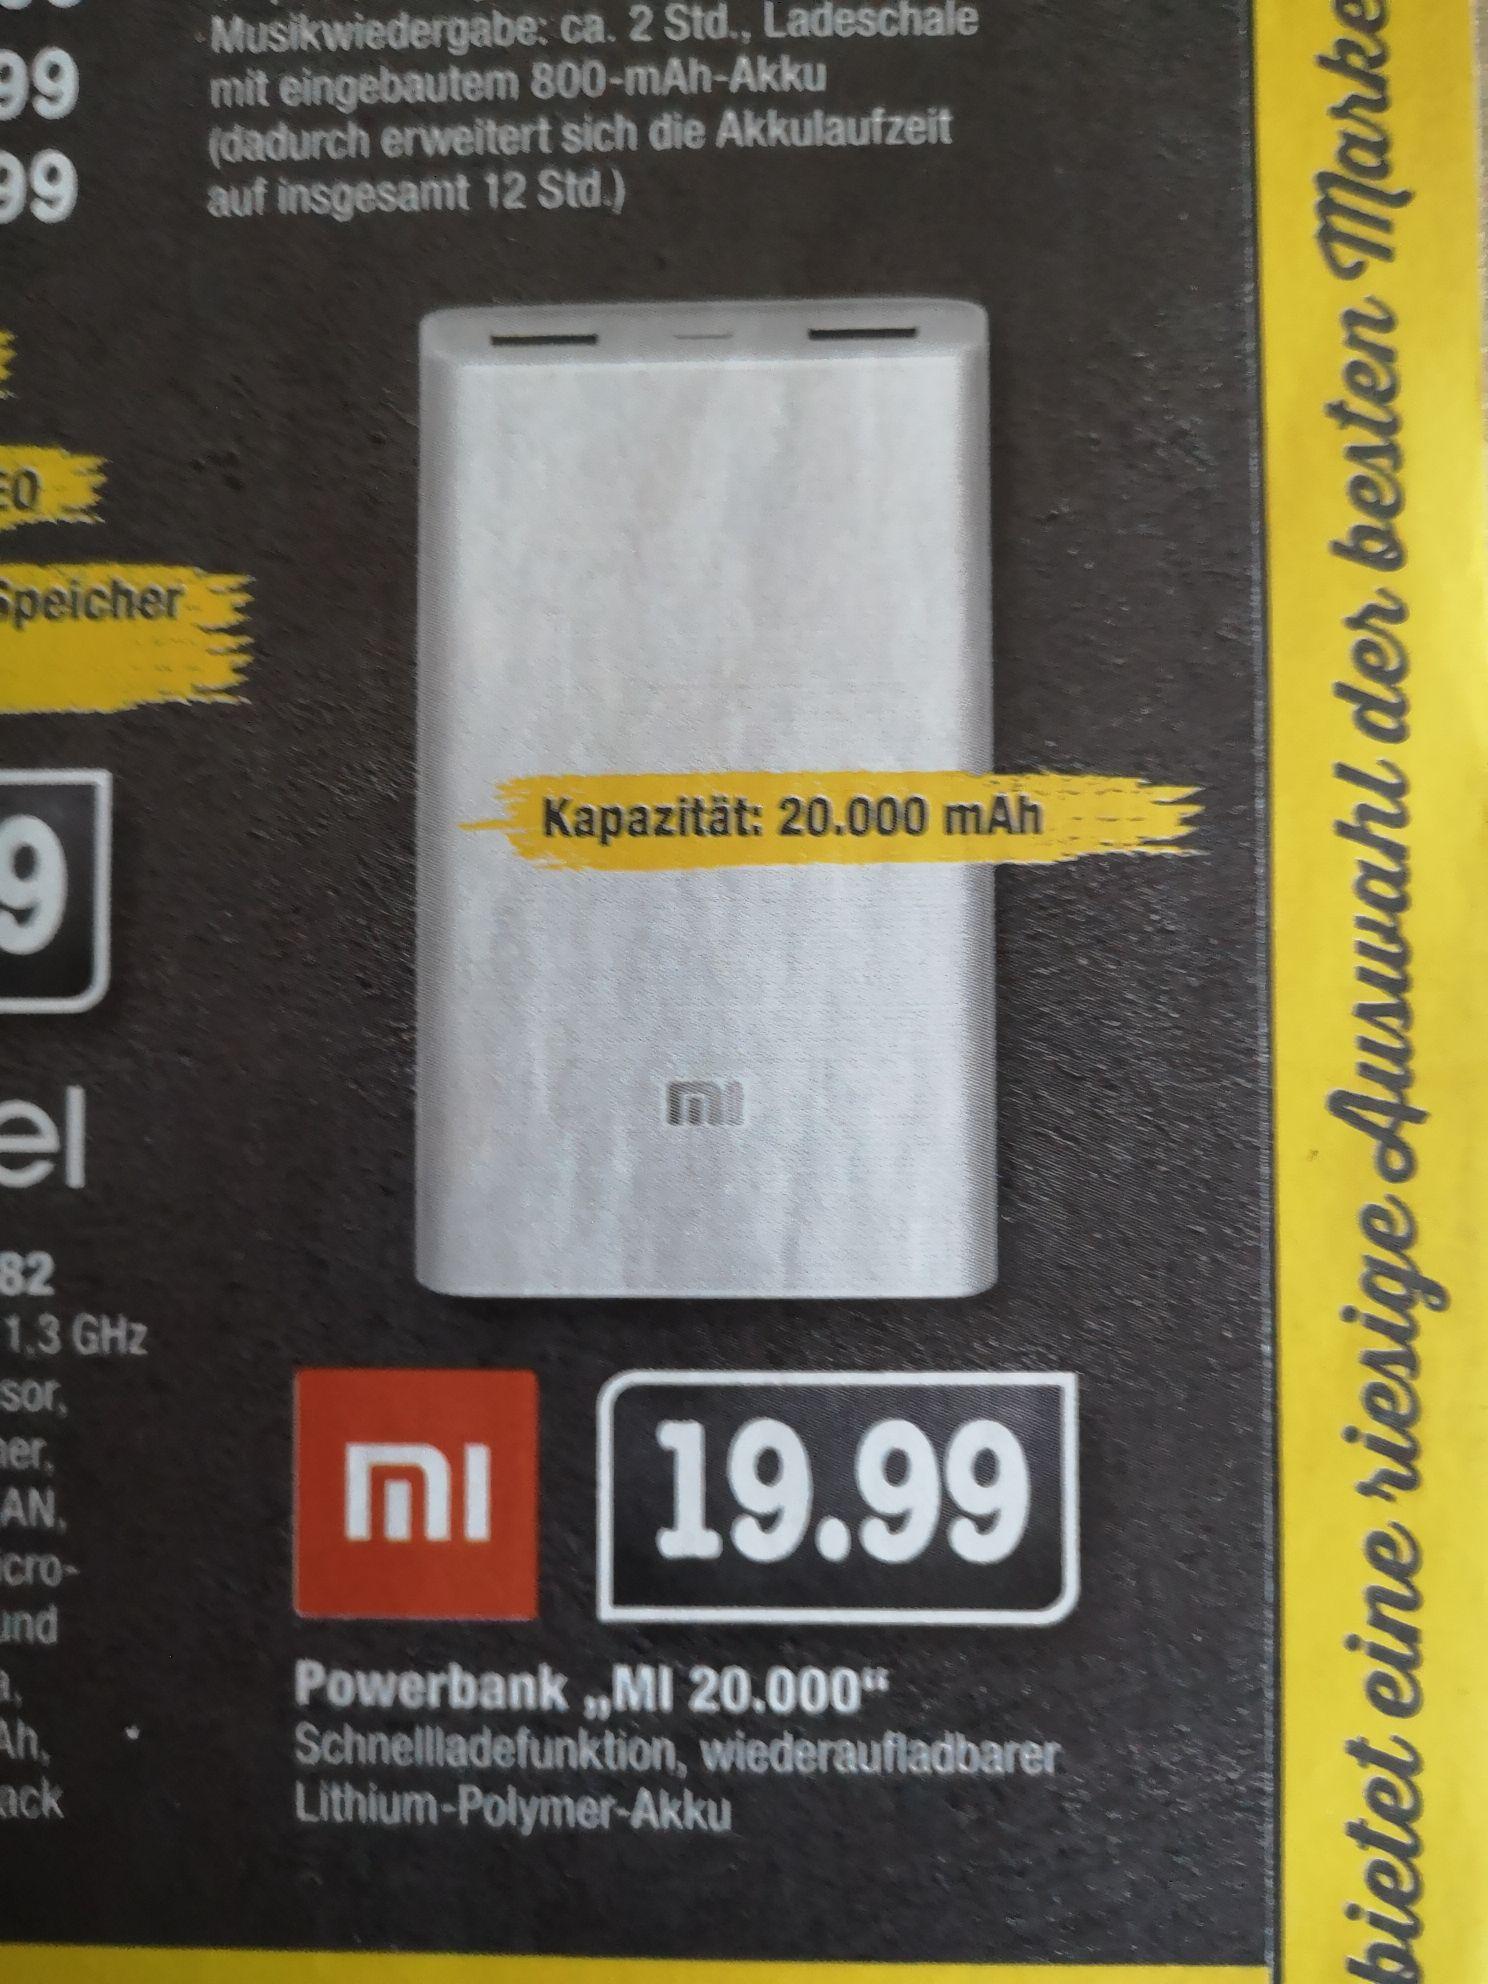 [Lokal Ecenter BW] Xiaomi Powerbank MI 20000 mAh